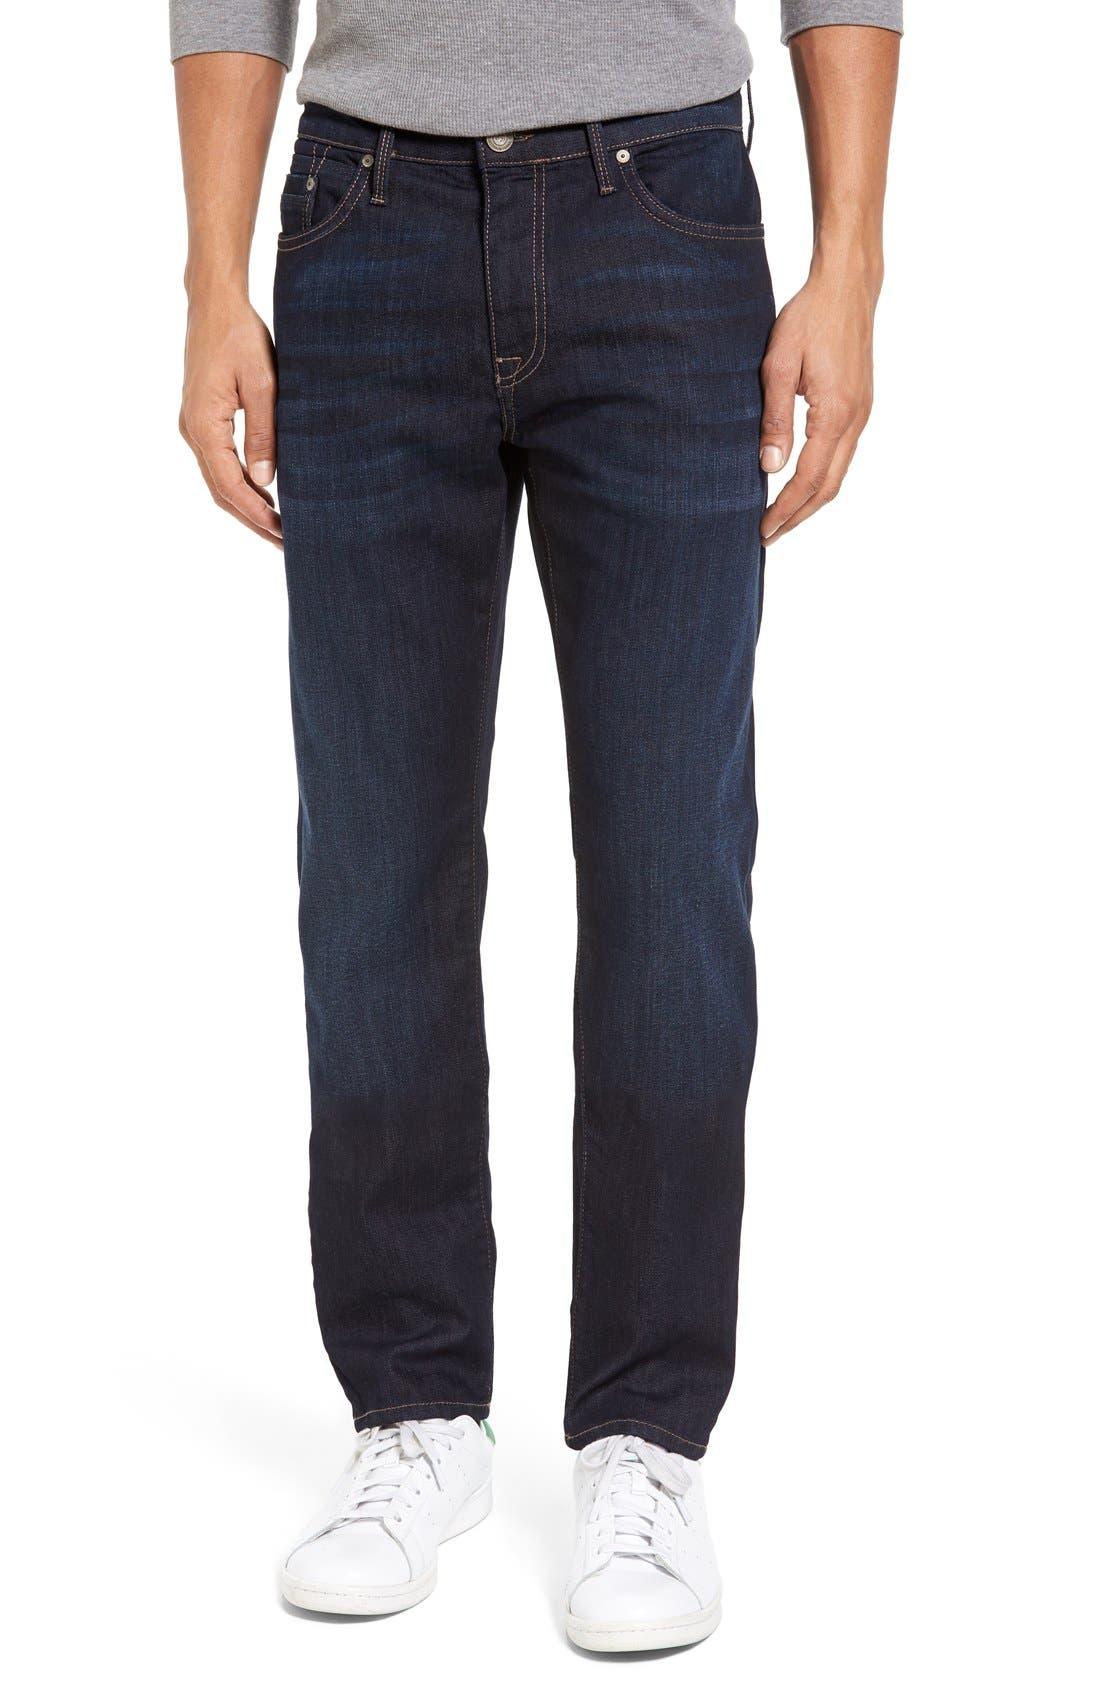 Mens Martin; Tandis Que Martin; Rinse Ny Vintage Comfort Jeans Mavi Rincer Nouveaux Jeans Confort Cru Mavi J7MG8CH